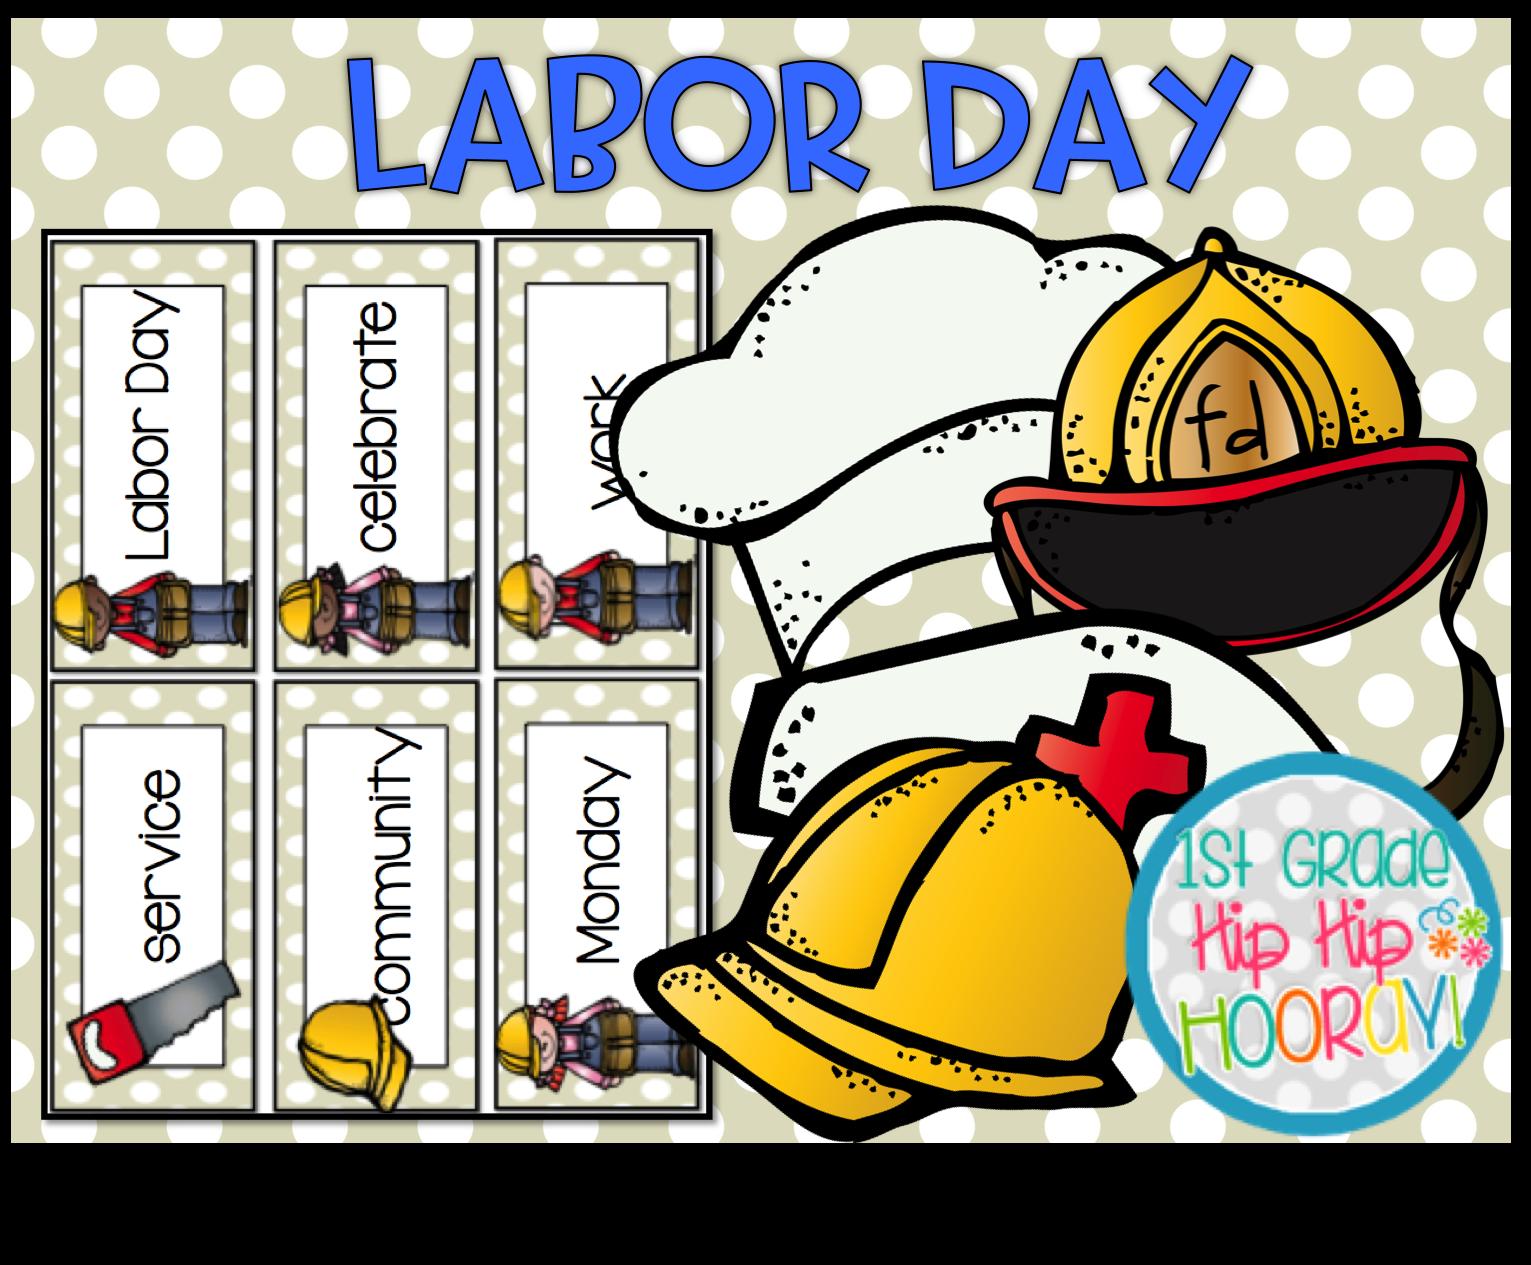 small resolution of 1st Grade Hip Hip Hooray!: Labor Day!